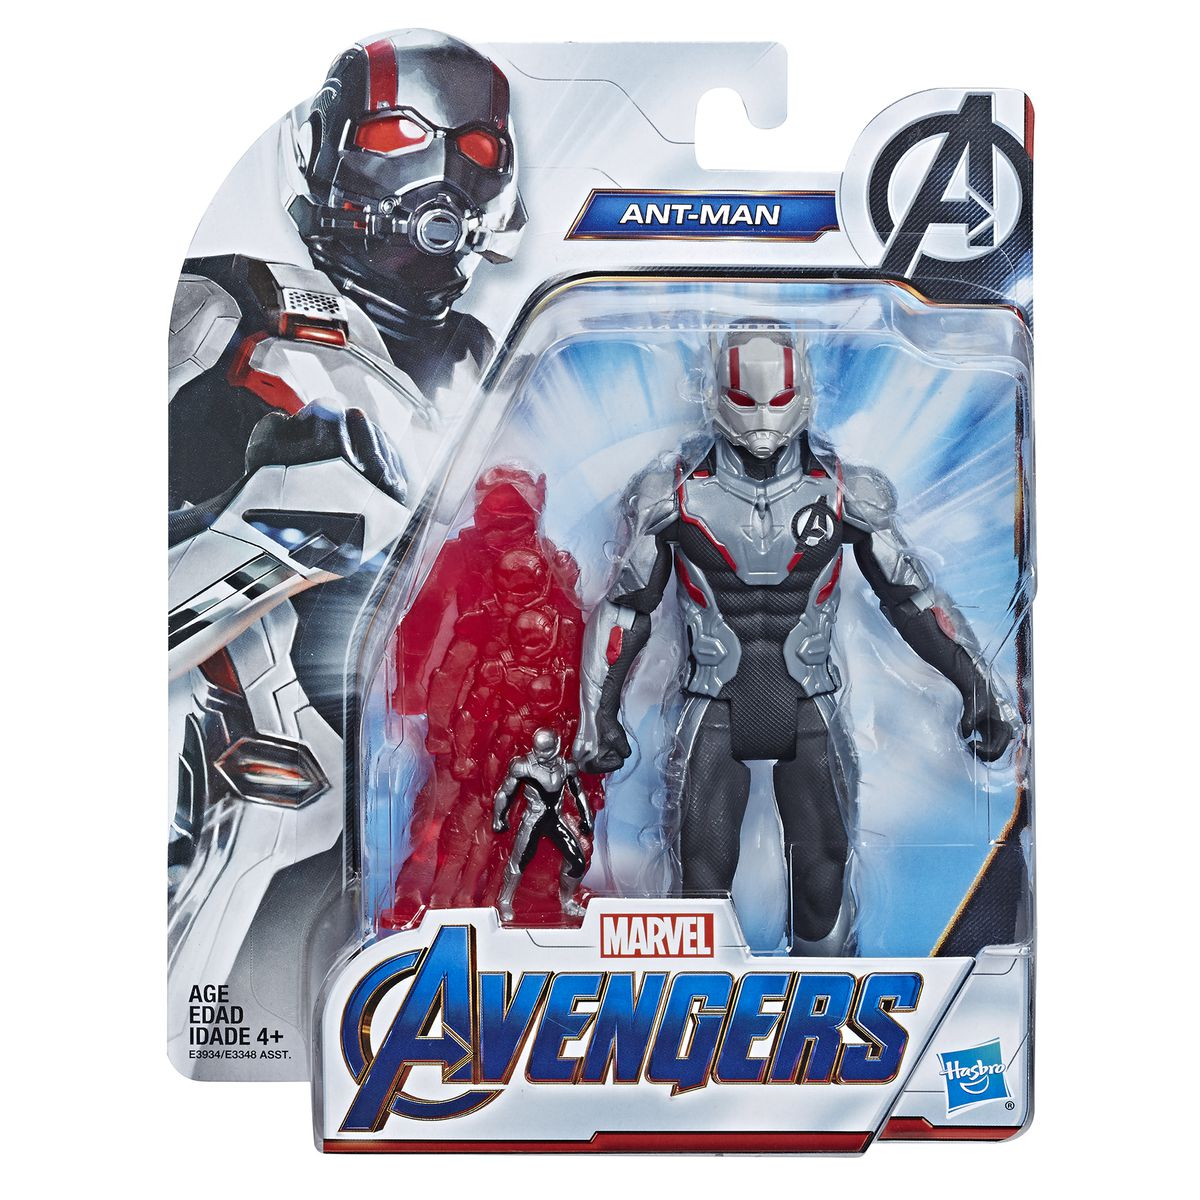 6-inch ant-man figure from avengers: endgame